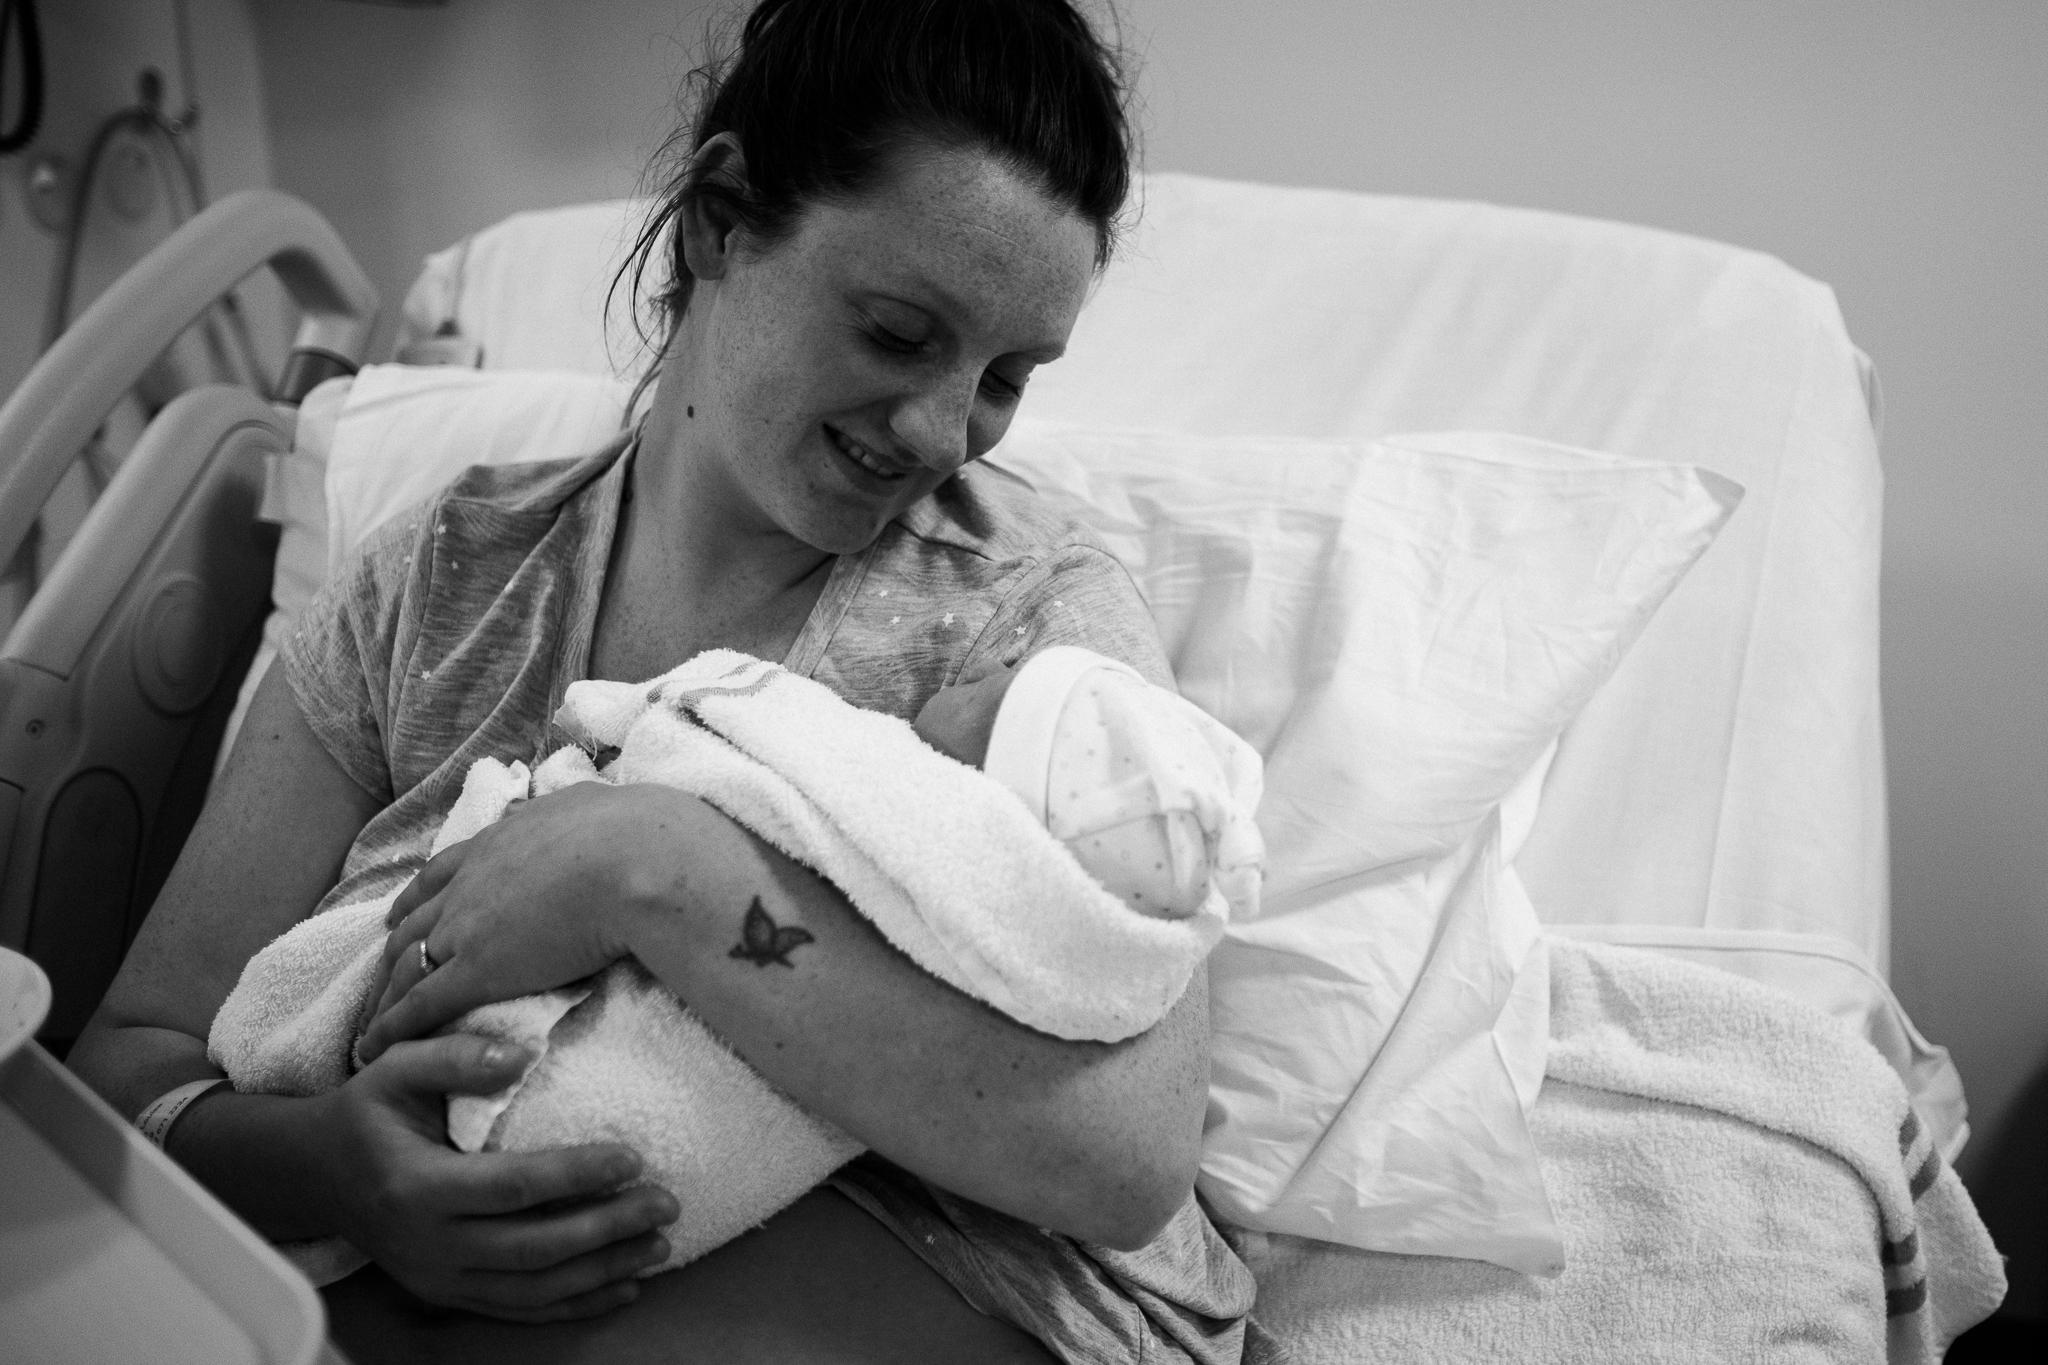 Birth Photographer Documentary Photography Newborn Baby Hospital Family - Jenny Harper-27.jpg